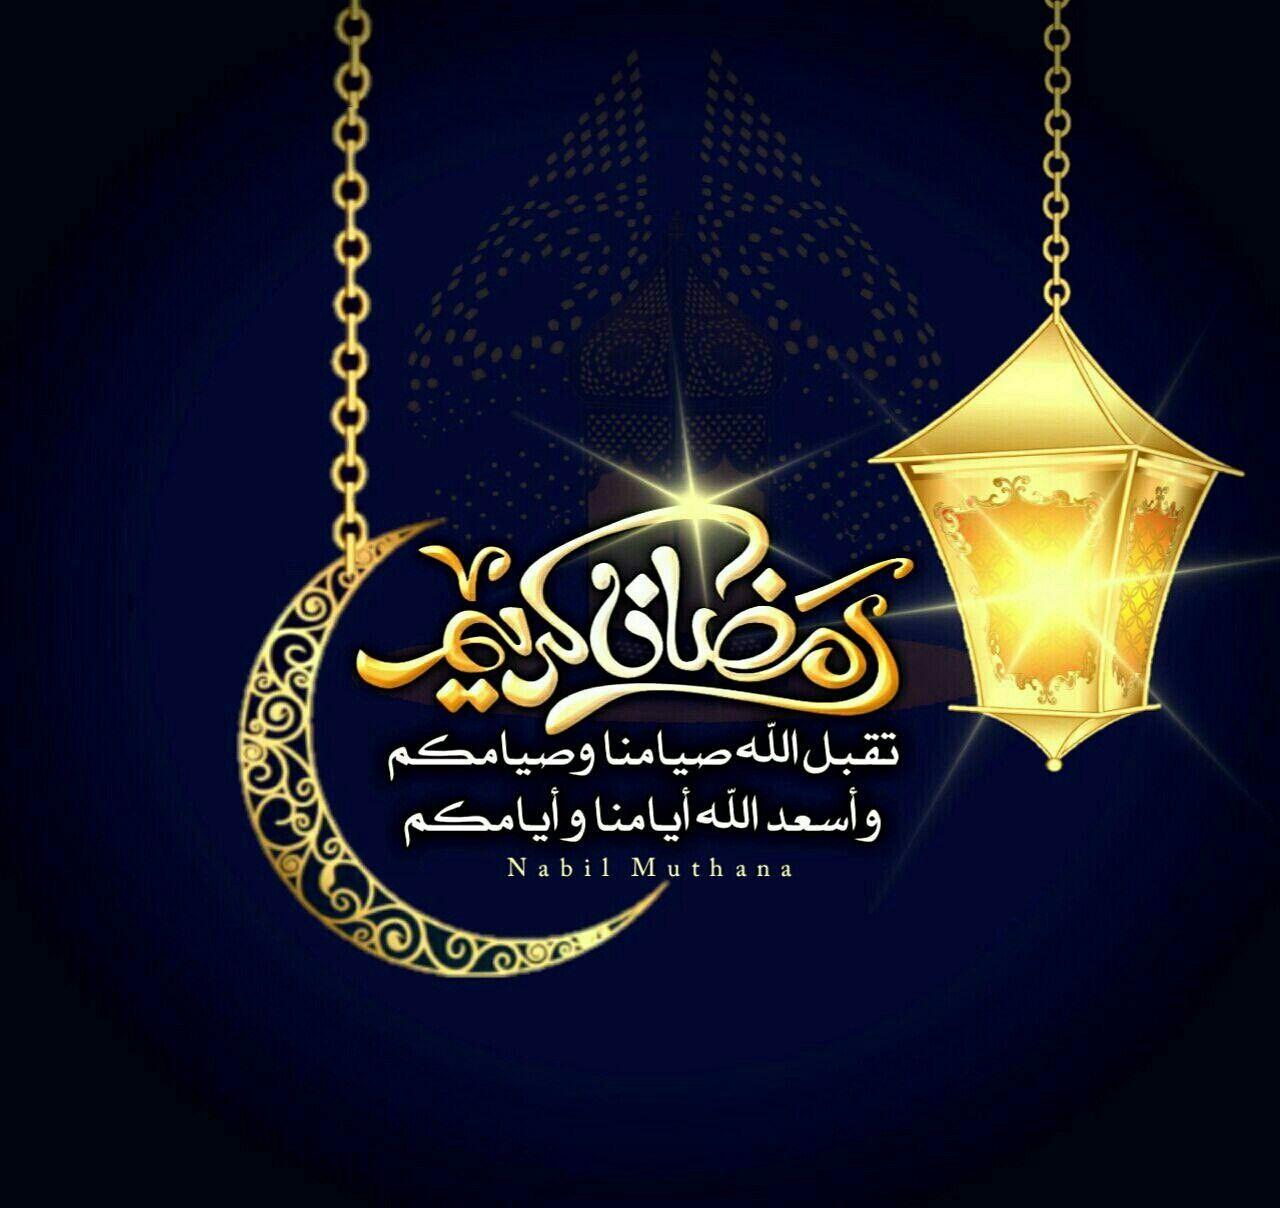 Desertrose أسأل الله في شهر رمضان المبارك أن يتوج أيامنا وأيامكم بقلوب مبتهجة وهموم منفرجة وصحة عامرة وأعمال صا Ramadan Kareem Ramadan Islamic Pictures